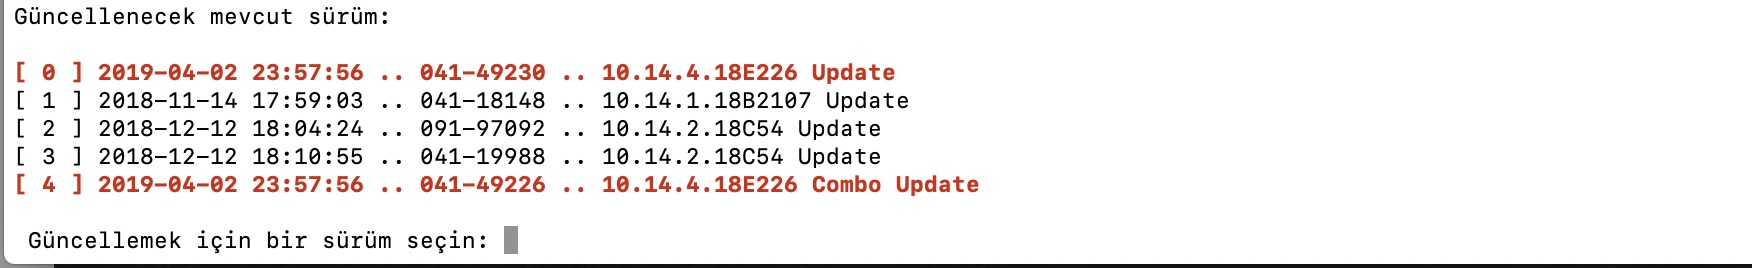 Ekran Resmi 2019-04-06 16.47.06.jpg